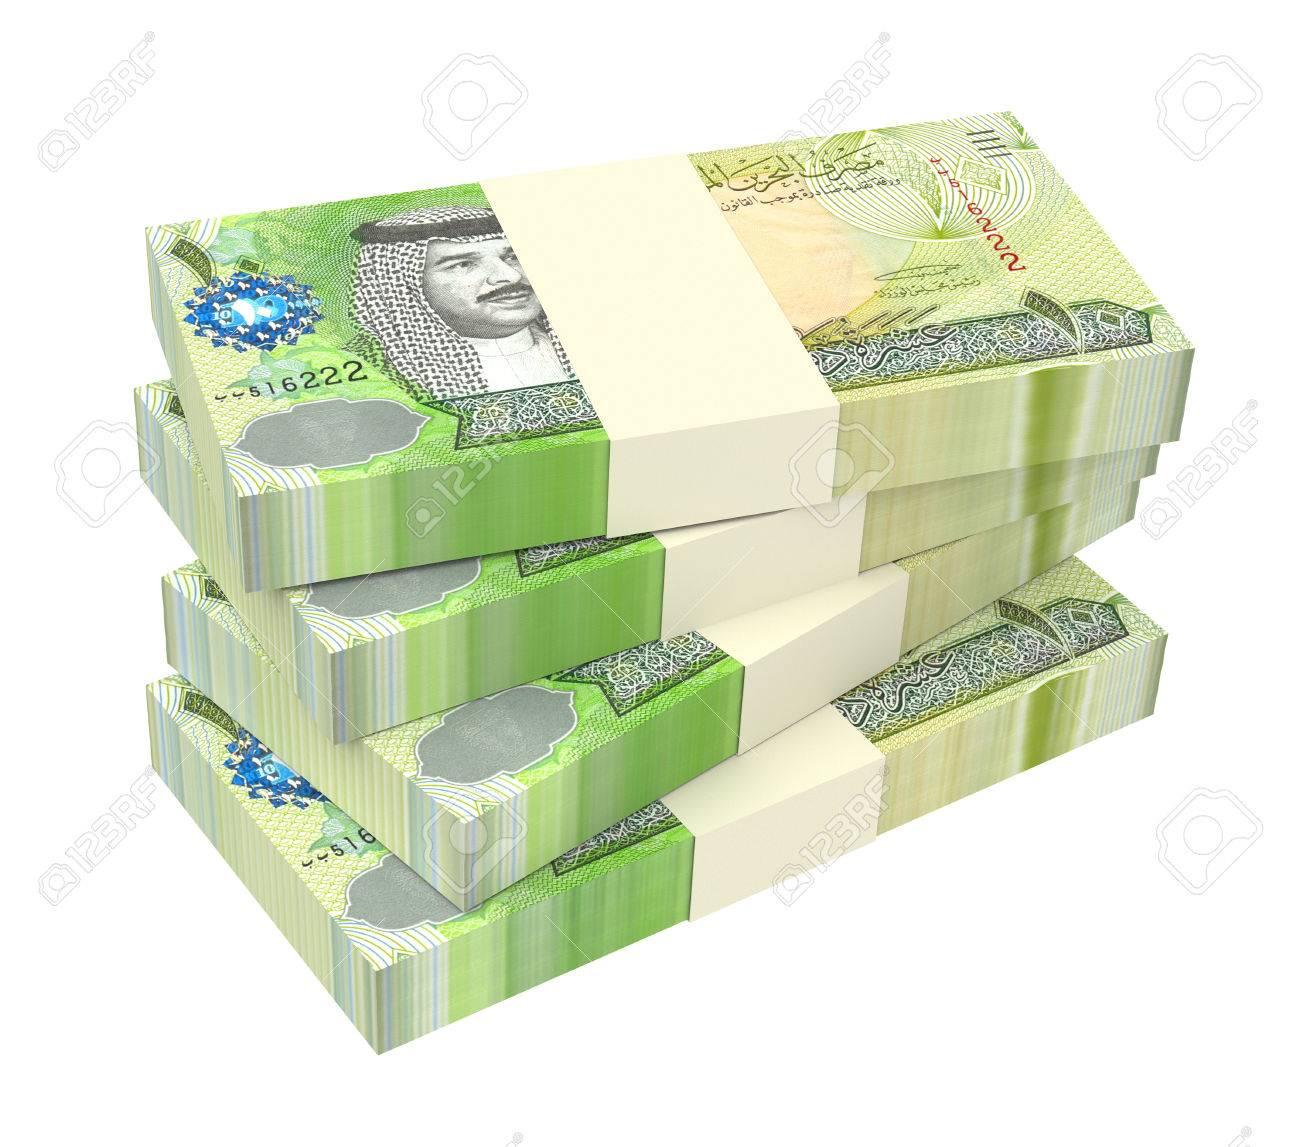 Real Money Spells In Kuwait, Bahrain